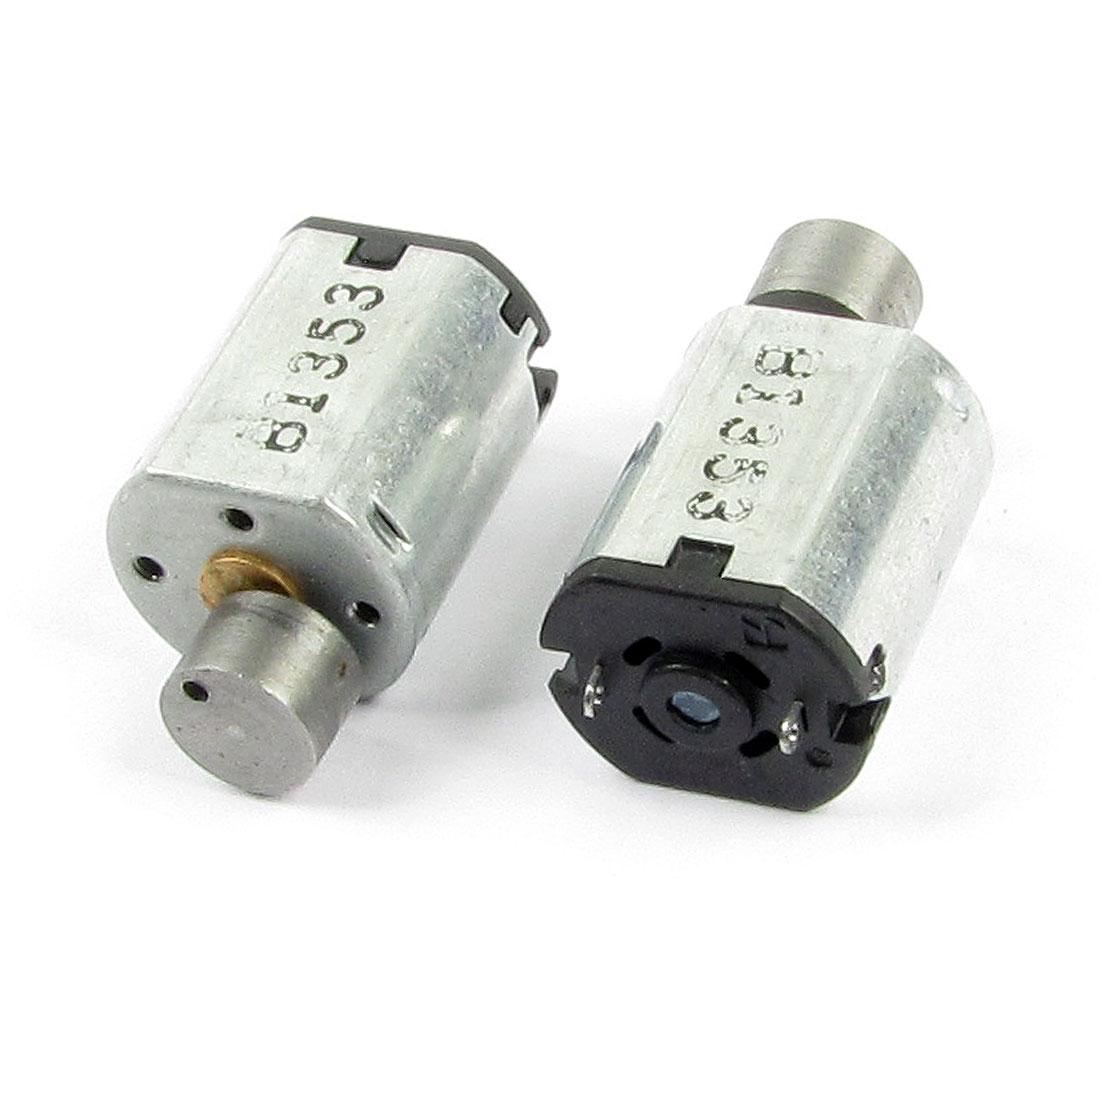 2PCS-DC-6V-0-06A-9000RPM-Output-Speed-Micro-Vibration-Motor